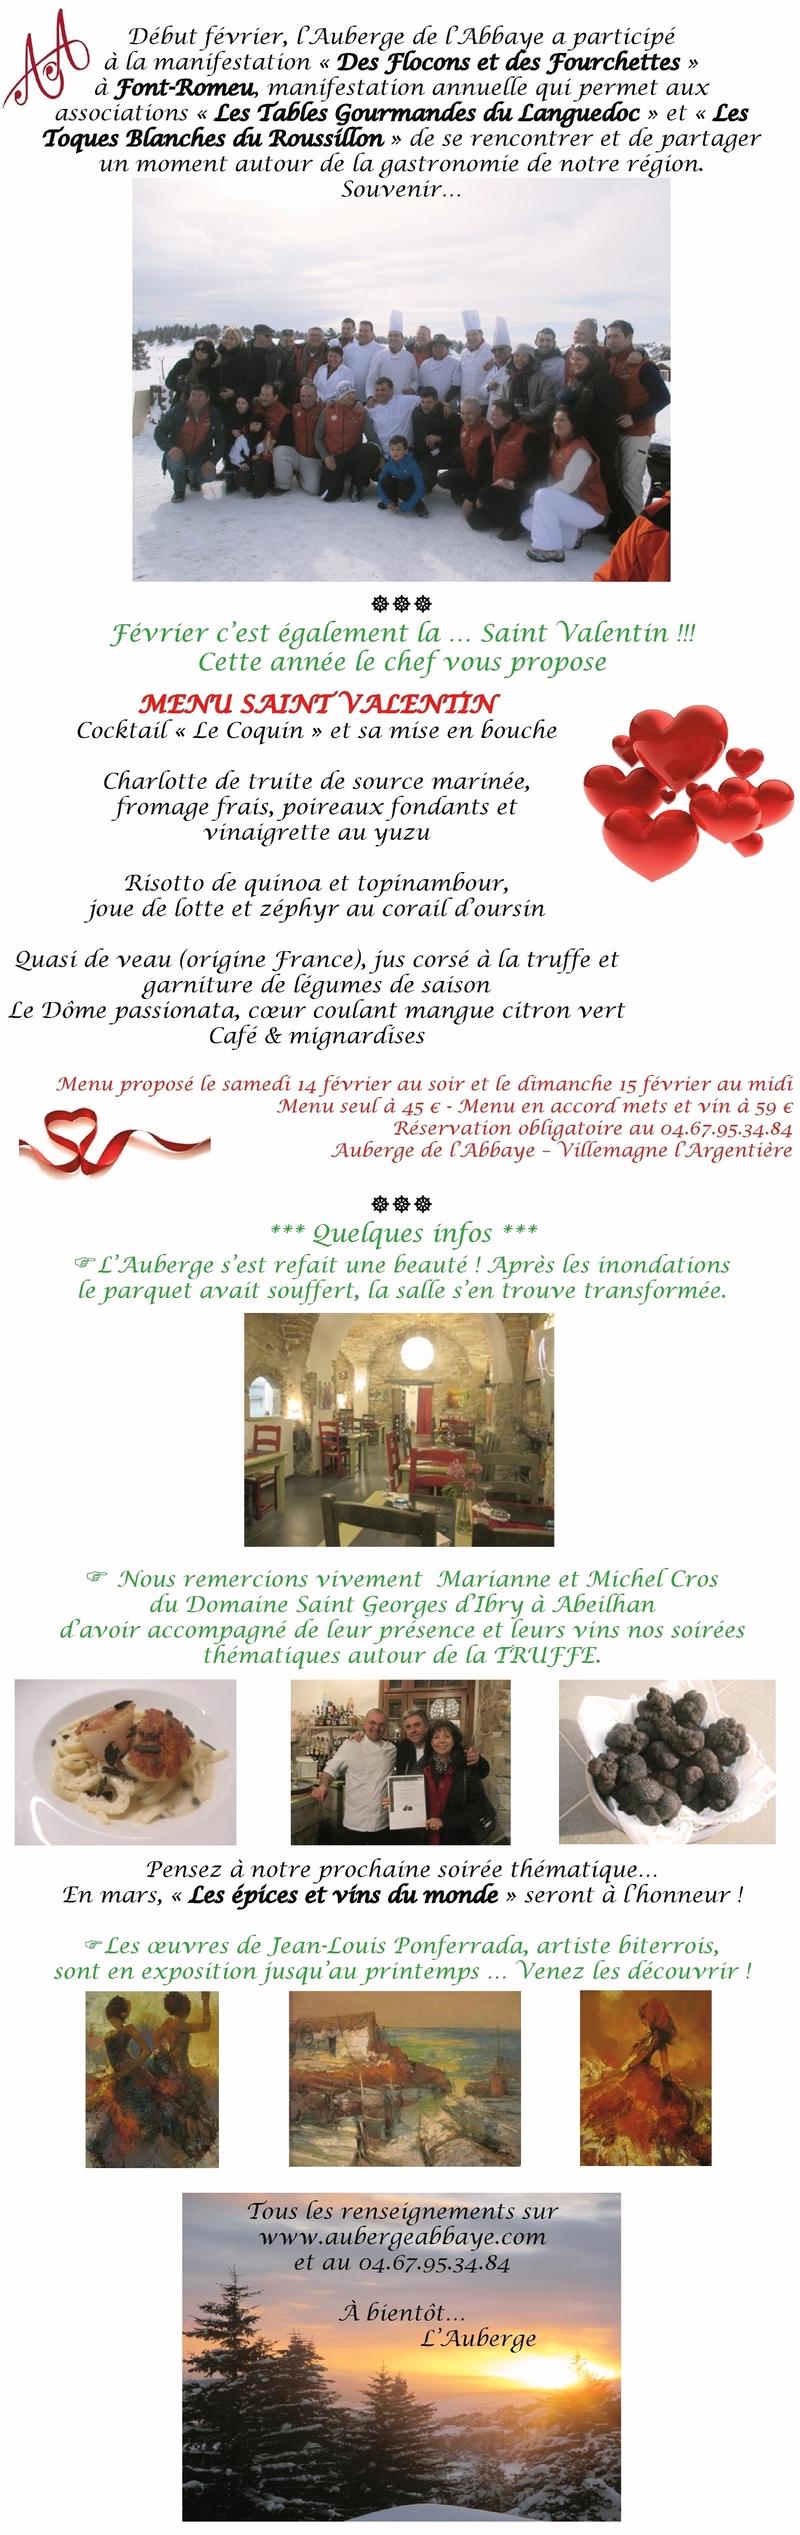 newsletter auberge de l'abbaye